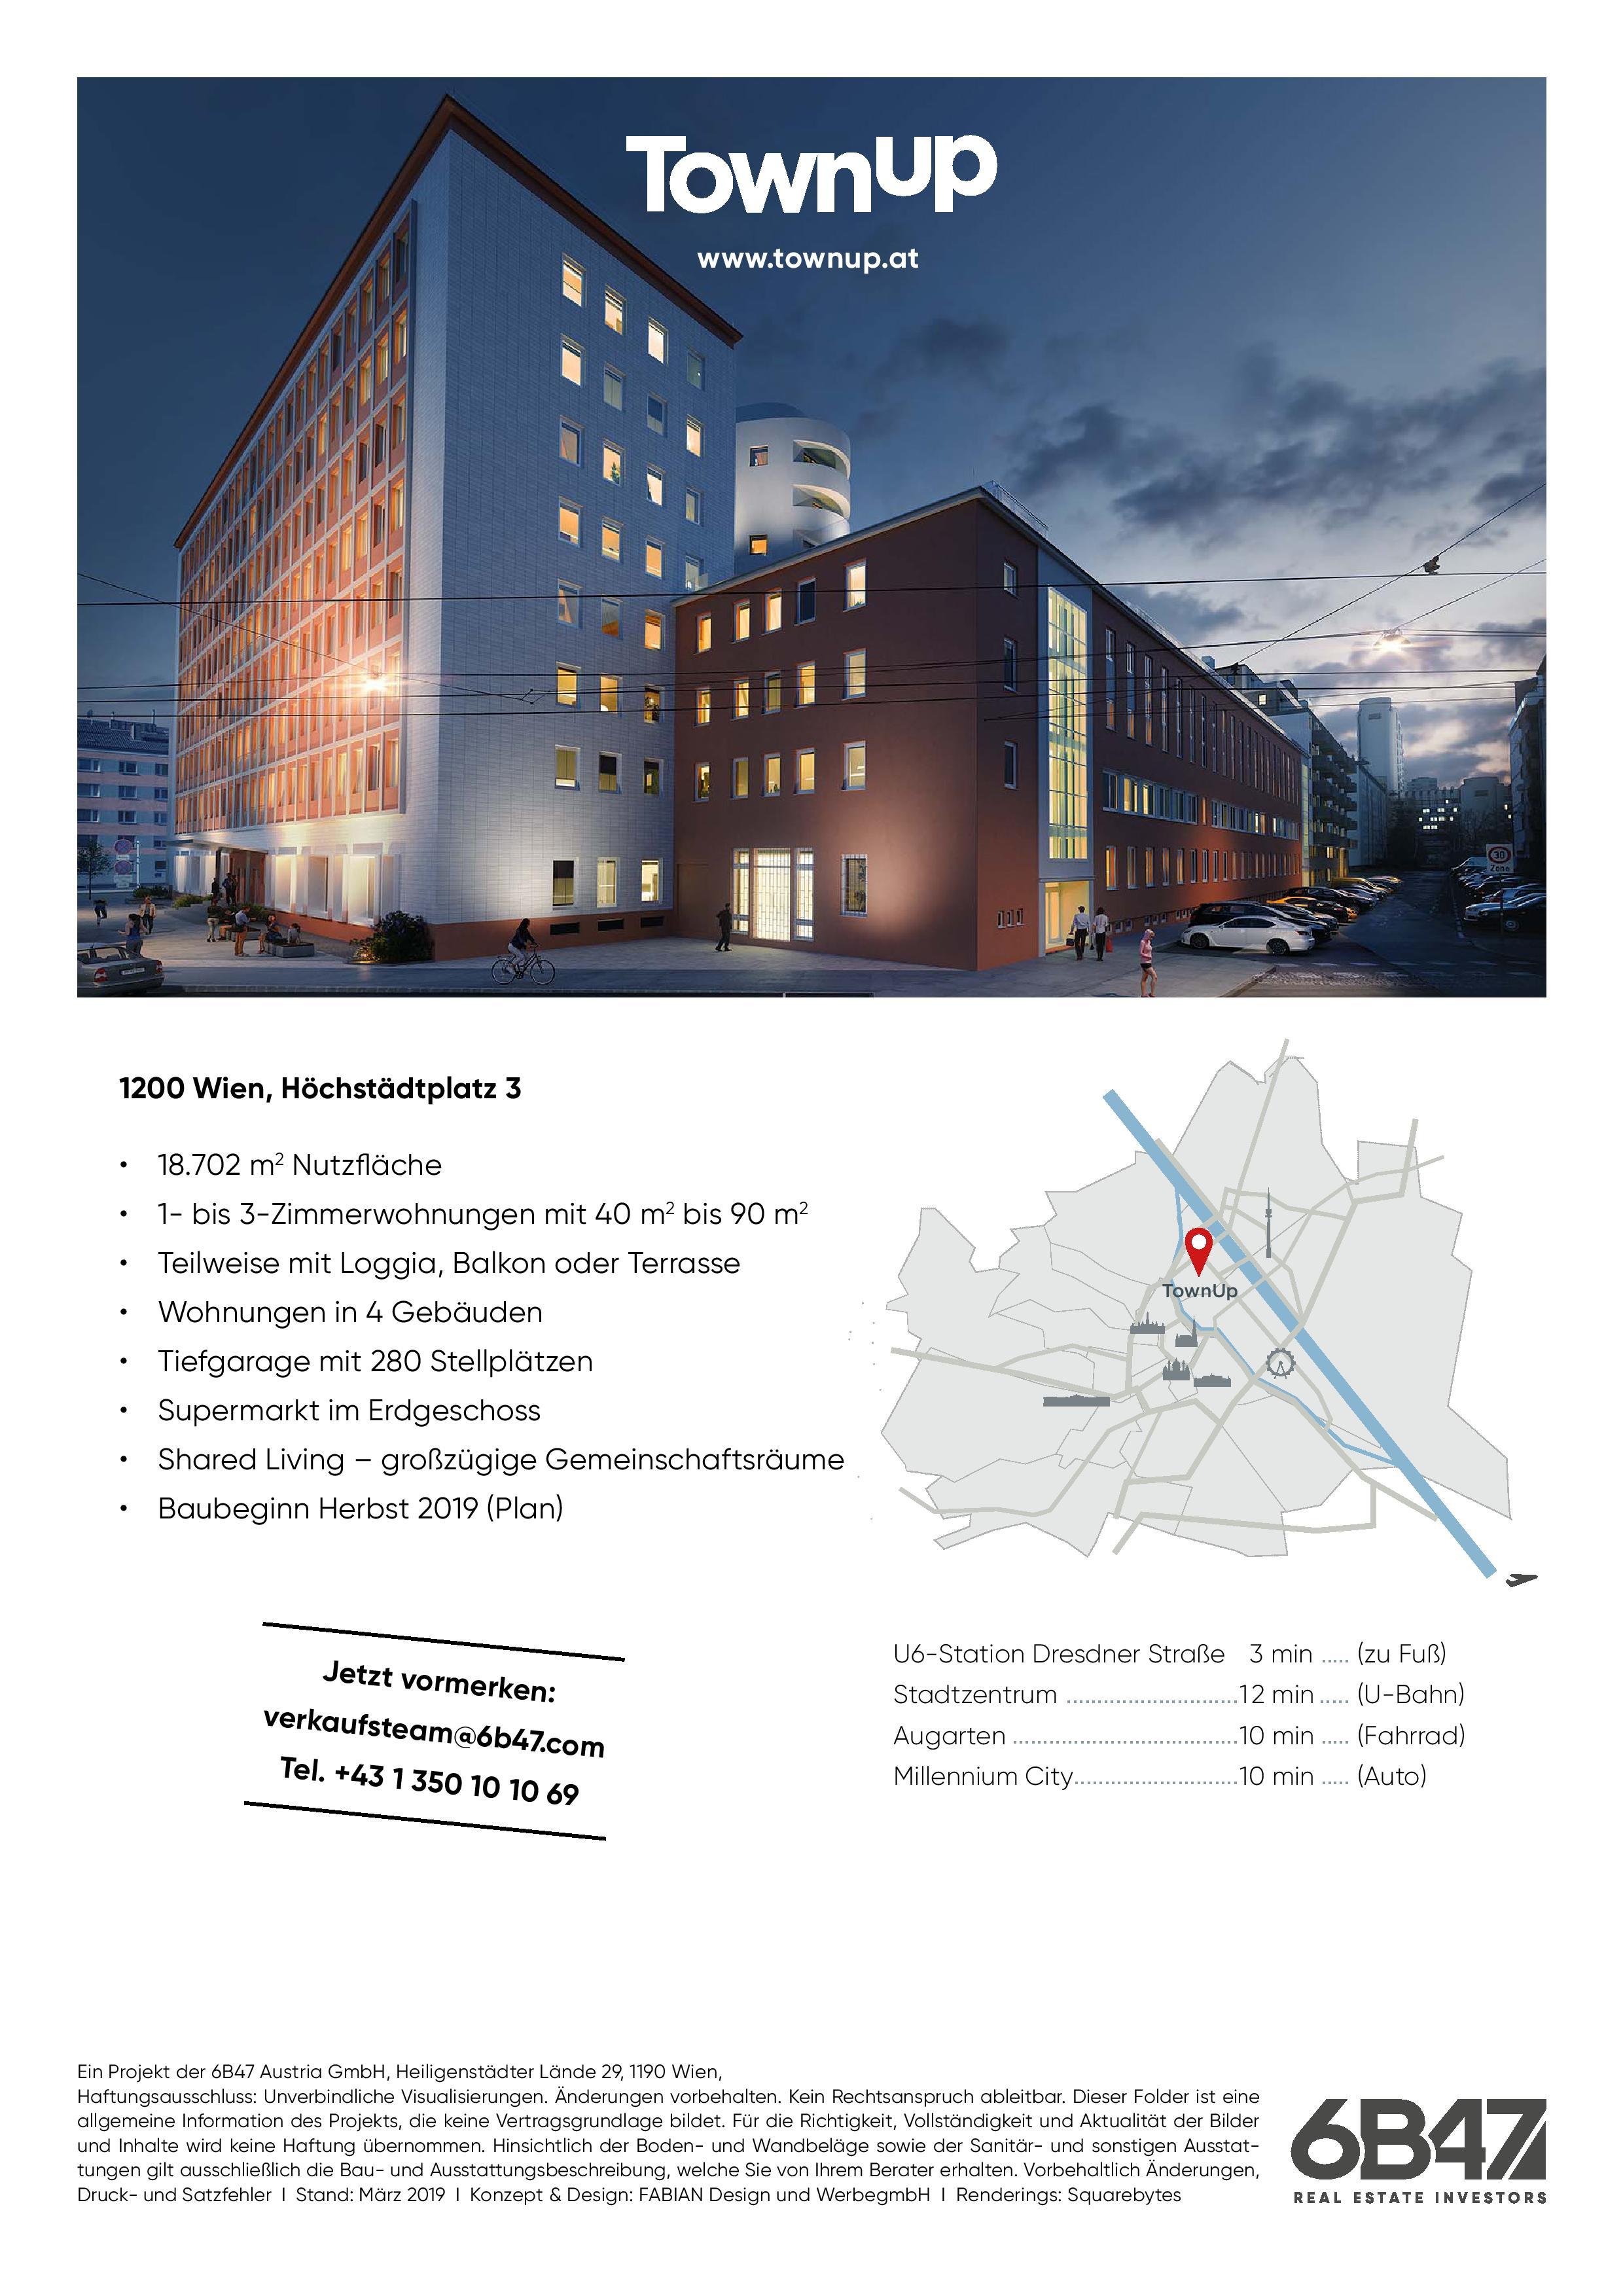 Wohnbauprojekt TownUp